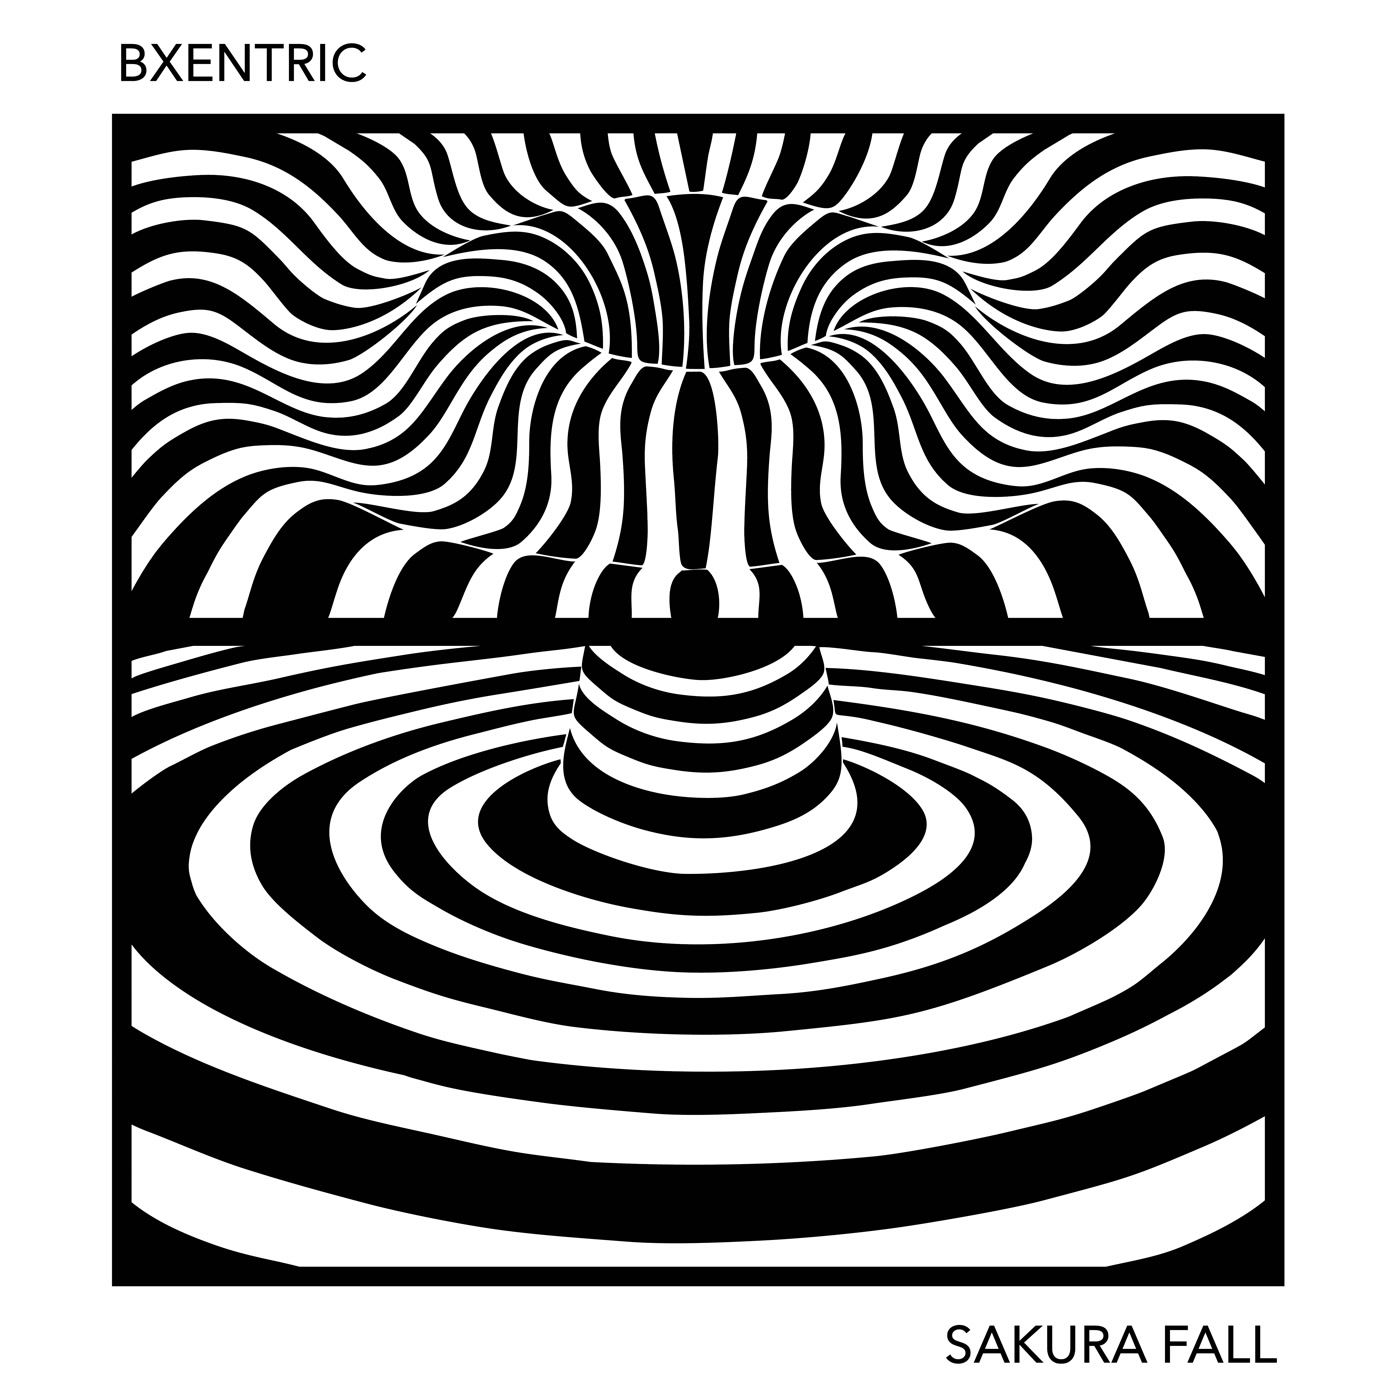 bxentric-sakura-fall.jpg